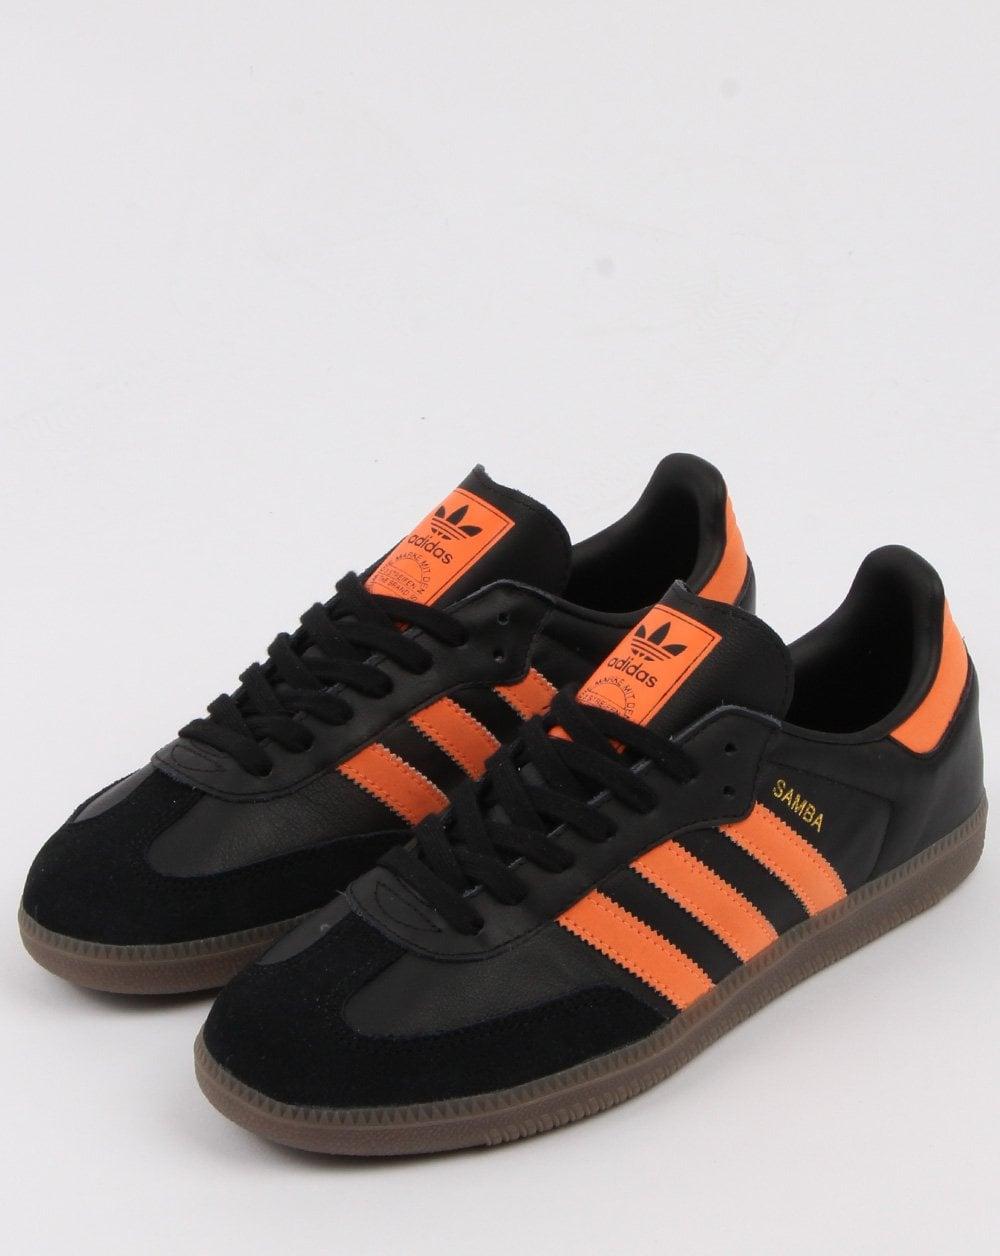 e1535ff724e ... best price adidas samba og trainers black orange b49b1 9f2d2